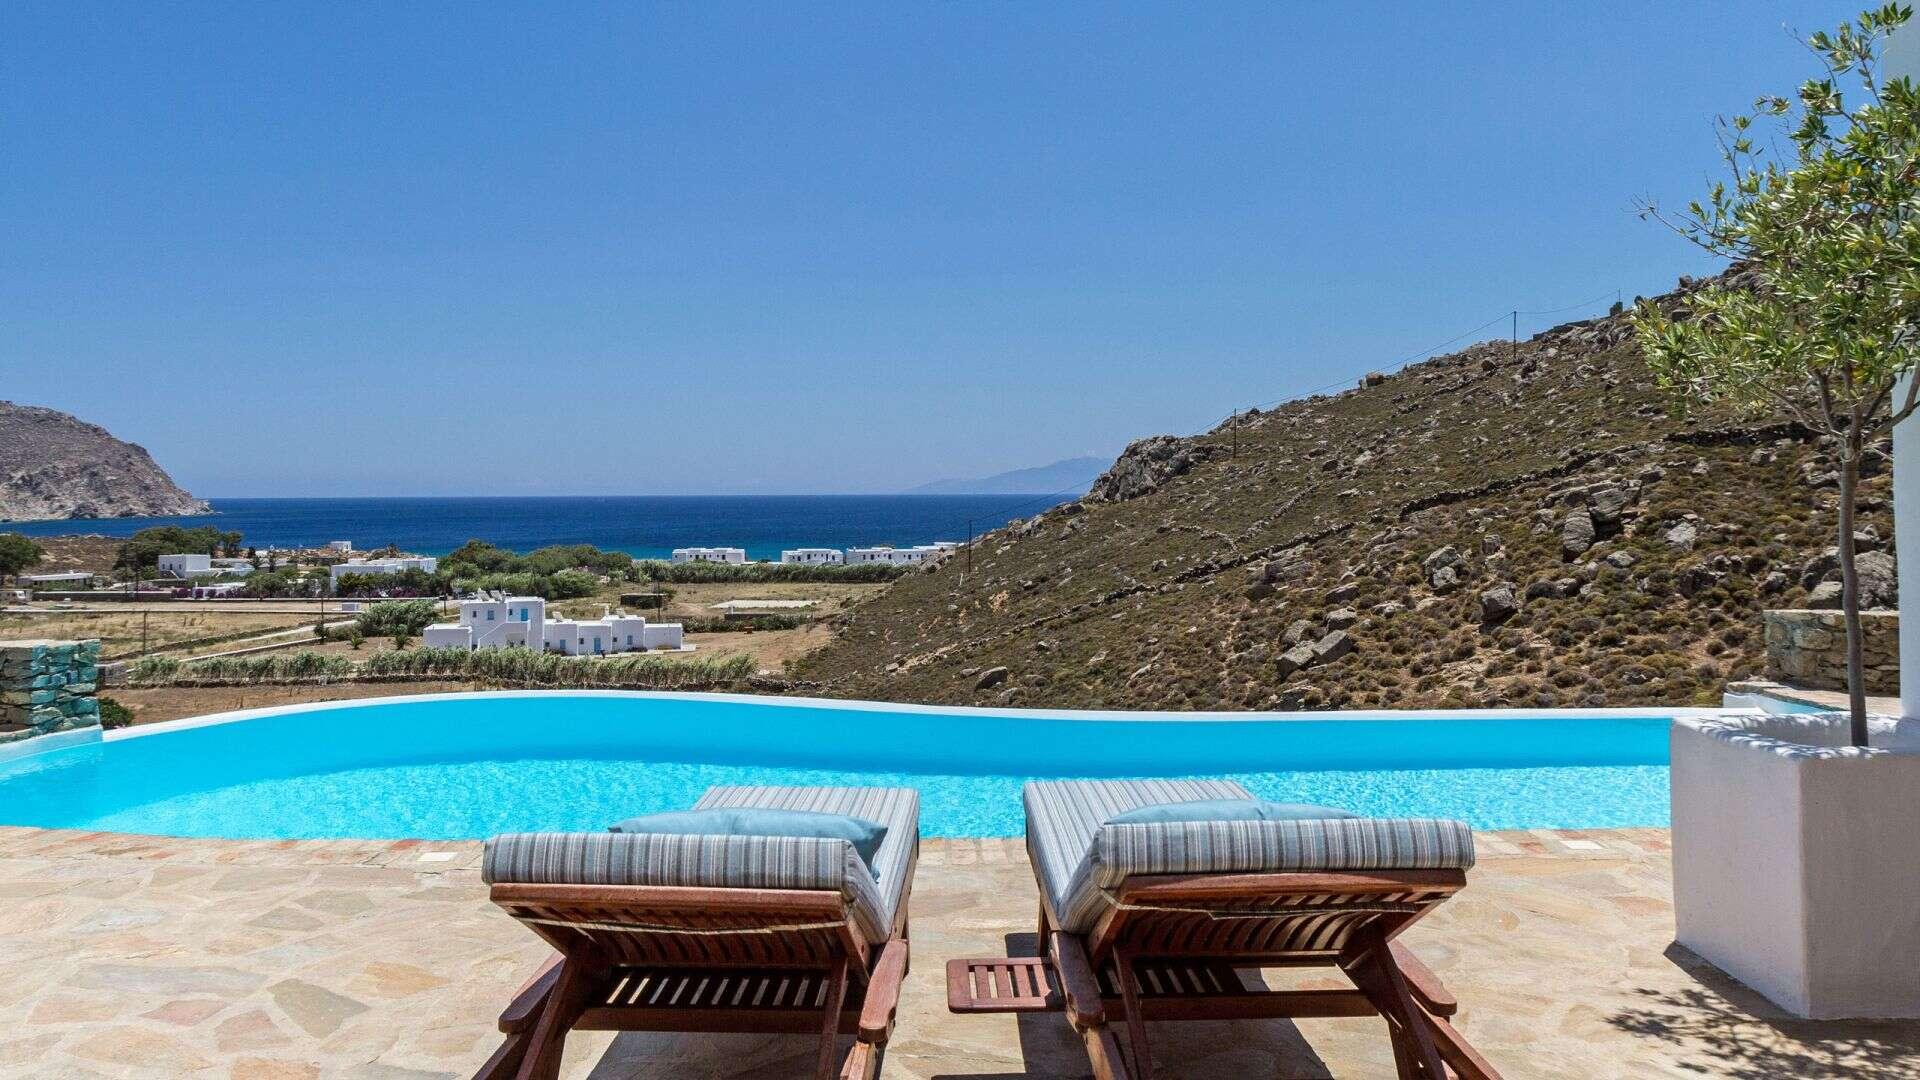 Luxury vacation rentals europe - Greece - Mykonos - Agrari beach - Agrari Beach House - Image 1/10